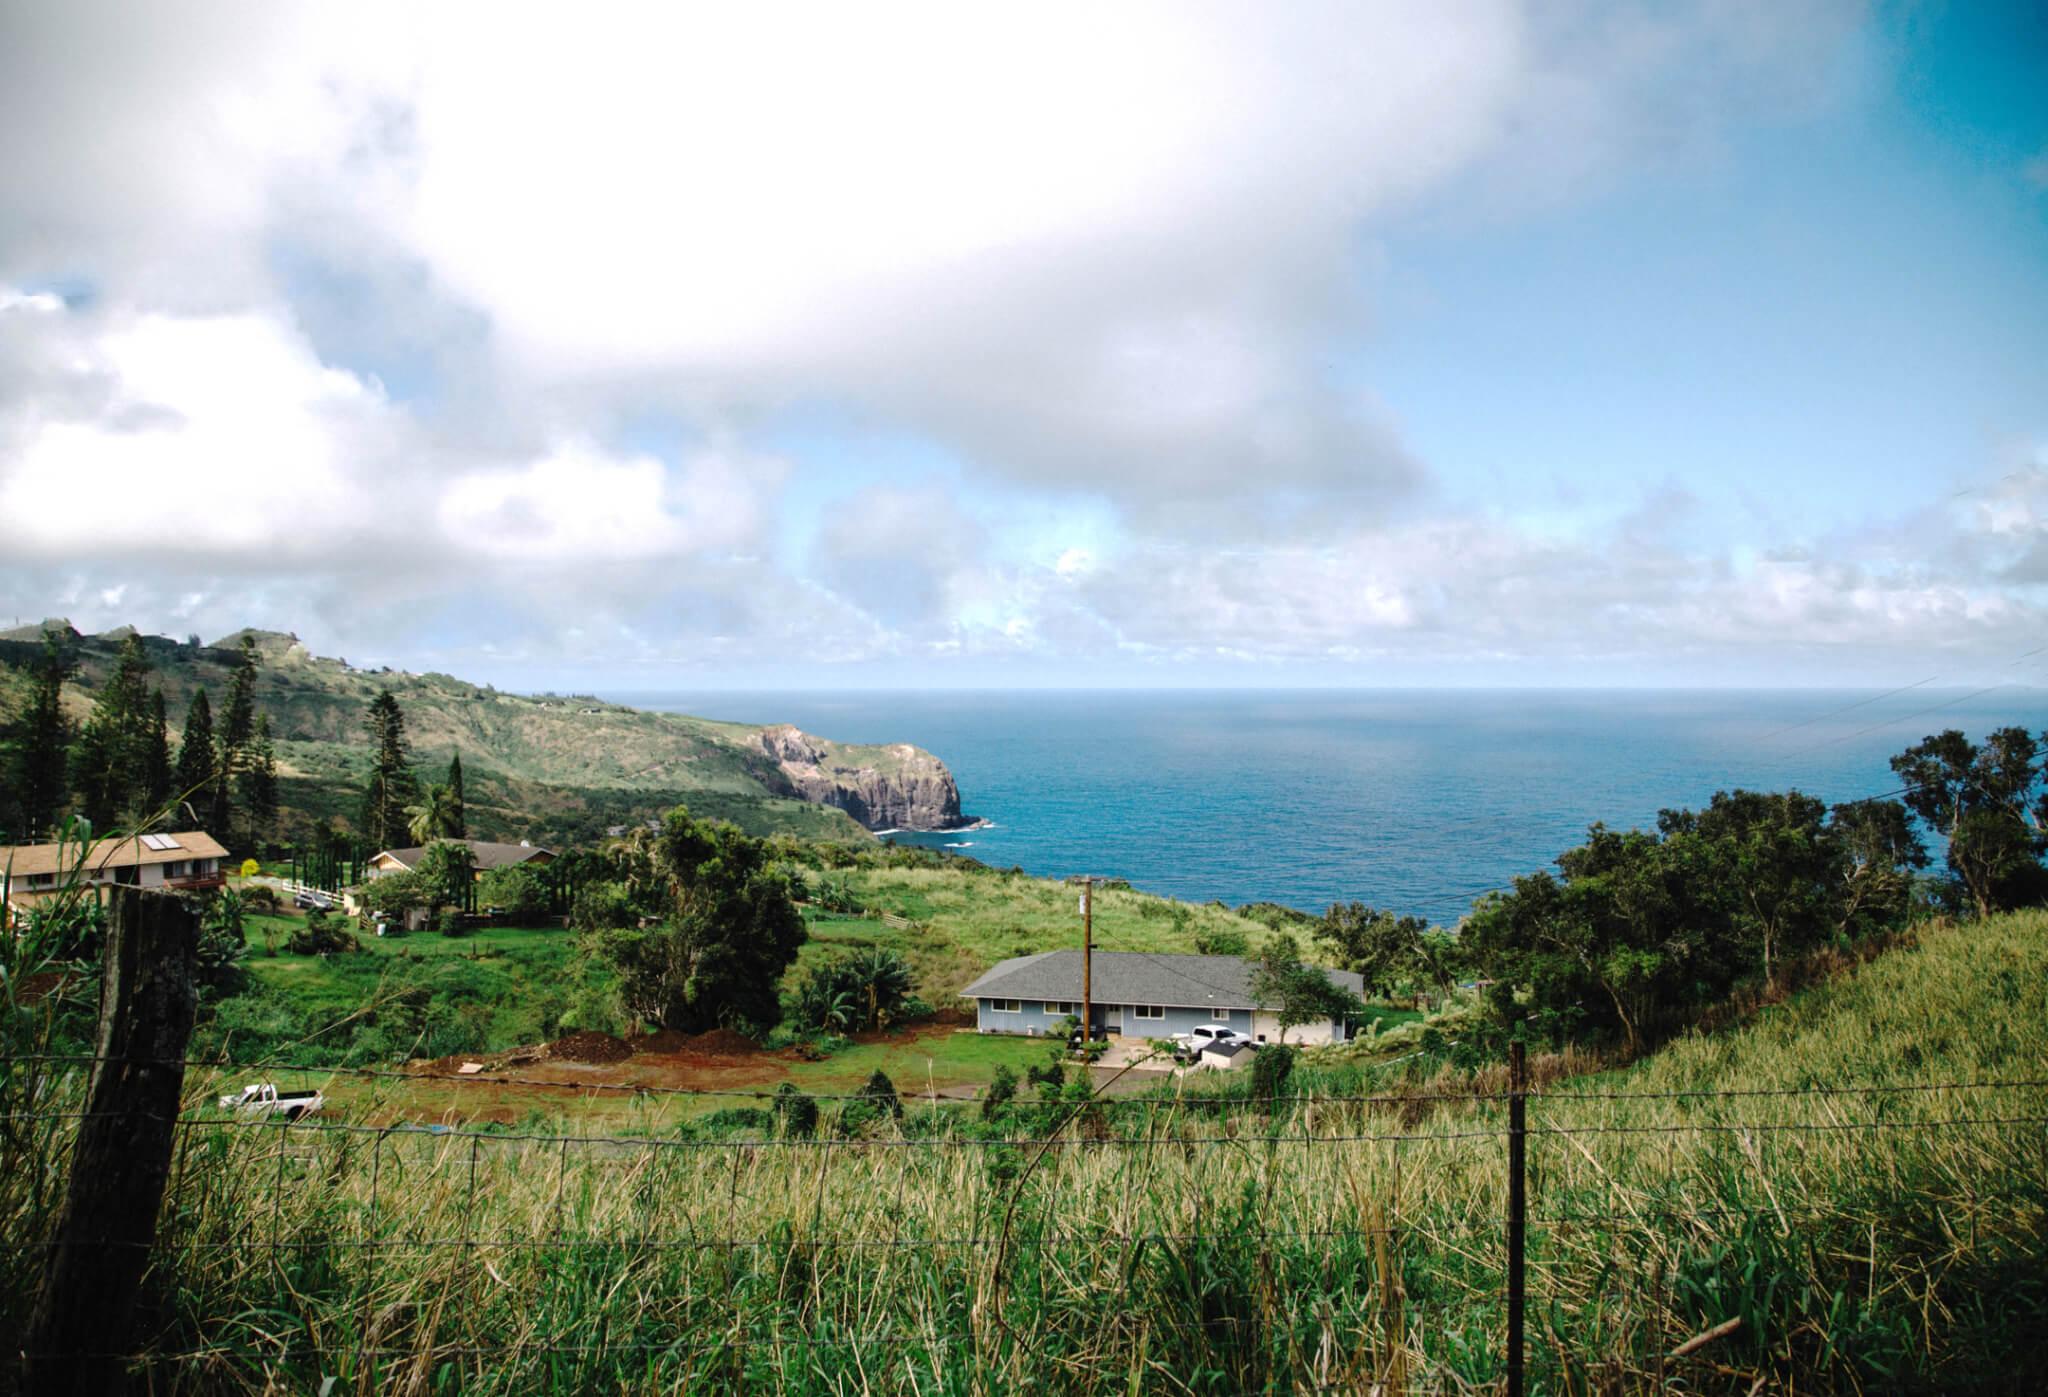 Secret Snorkeling Spot Lava Reserve Boasts Best